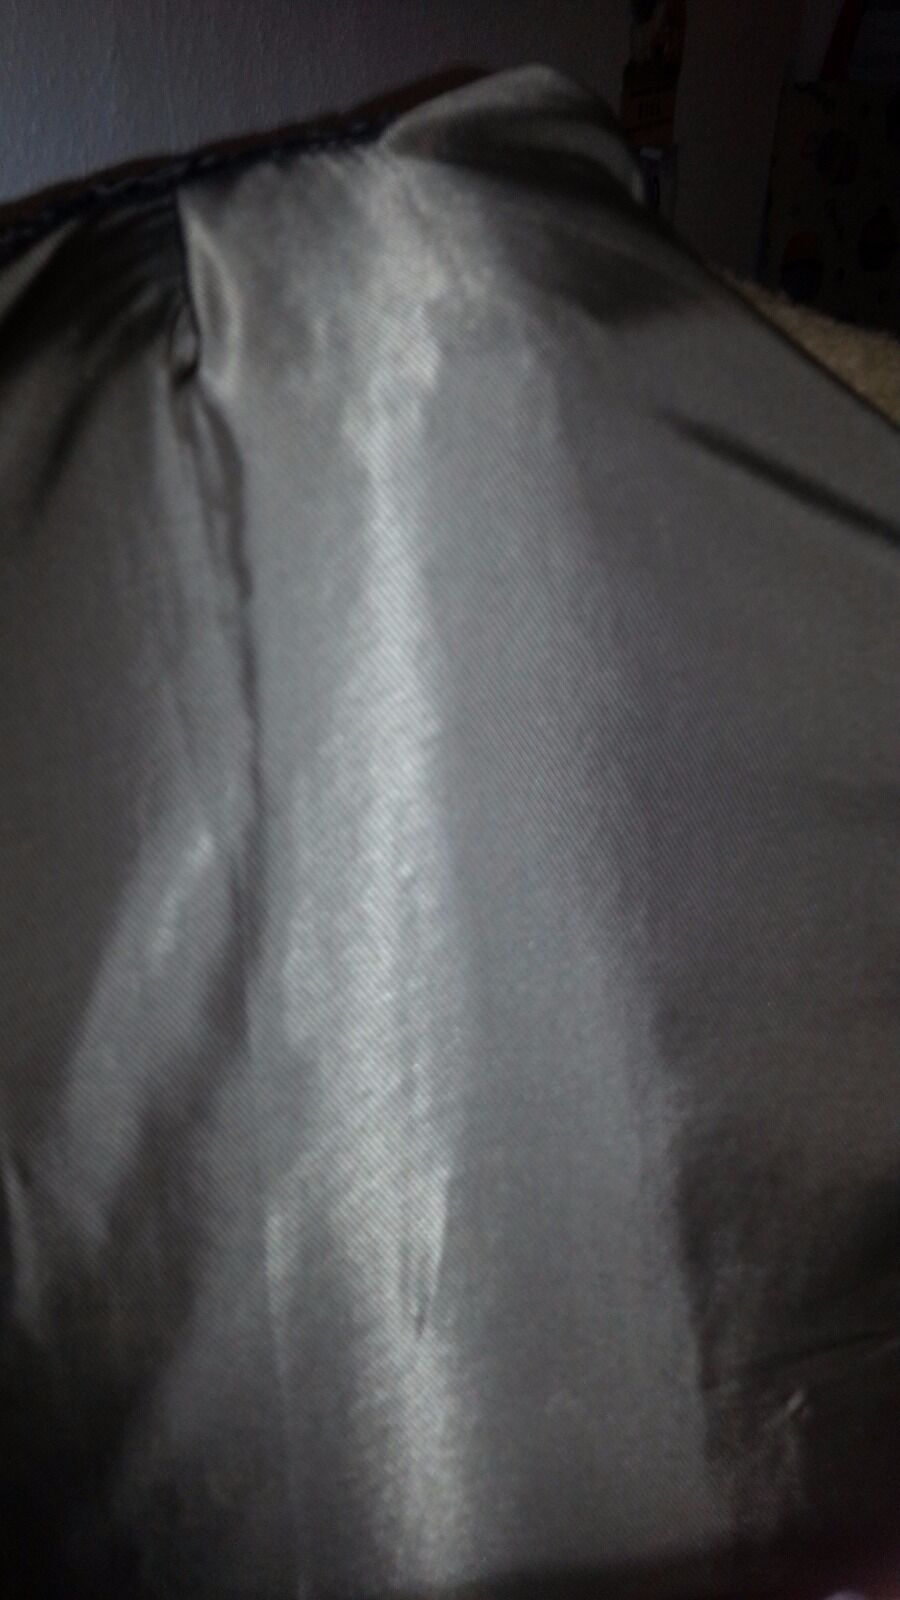 Mantel camelfarbend evento - christine christine christine breuer. Größe 38 40 | Genial  | Qualität Produkte  | Günstige Preise  6904d1